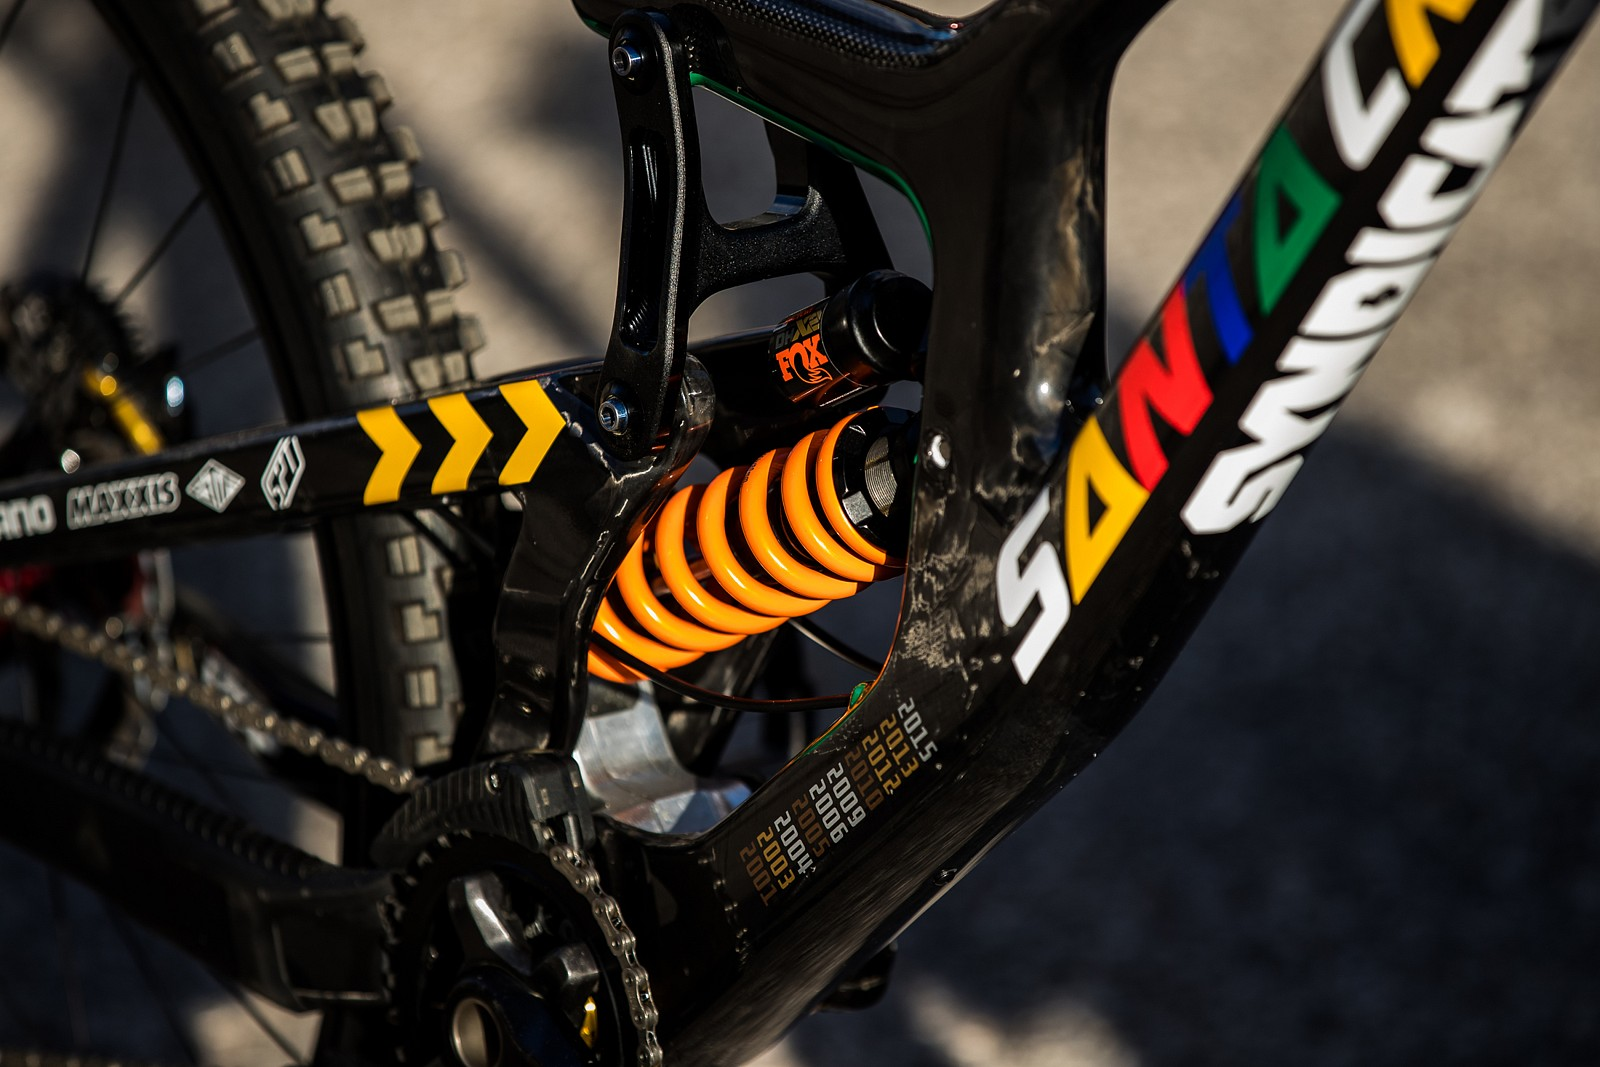 The Greatest of all Time - Greg Minnaar's Santa Cruz V10 - PIT BITS 4 - 2021 WORLD CHAMPS - Mountain Biking Pictures - Vital MTB